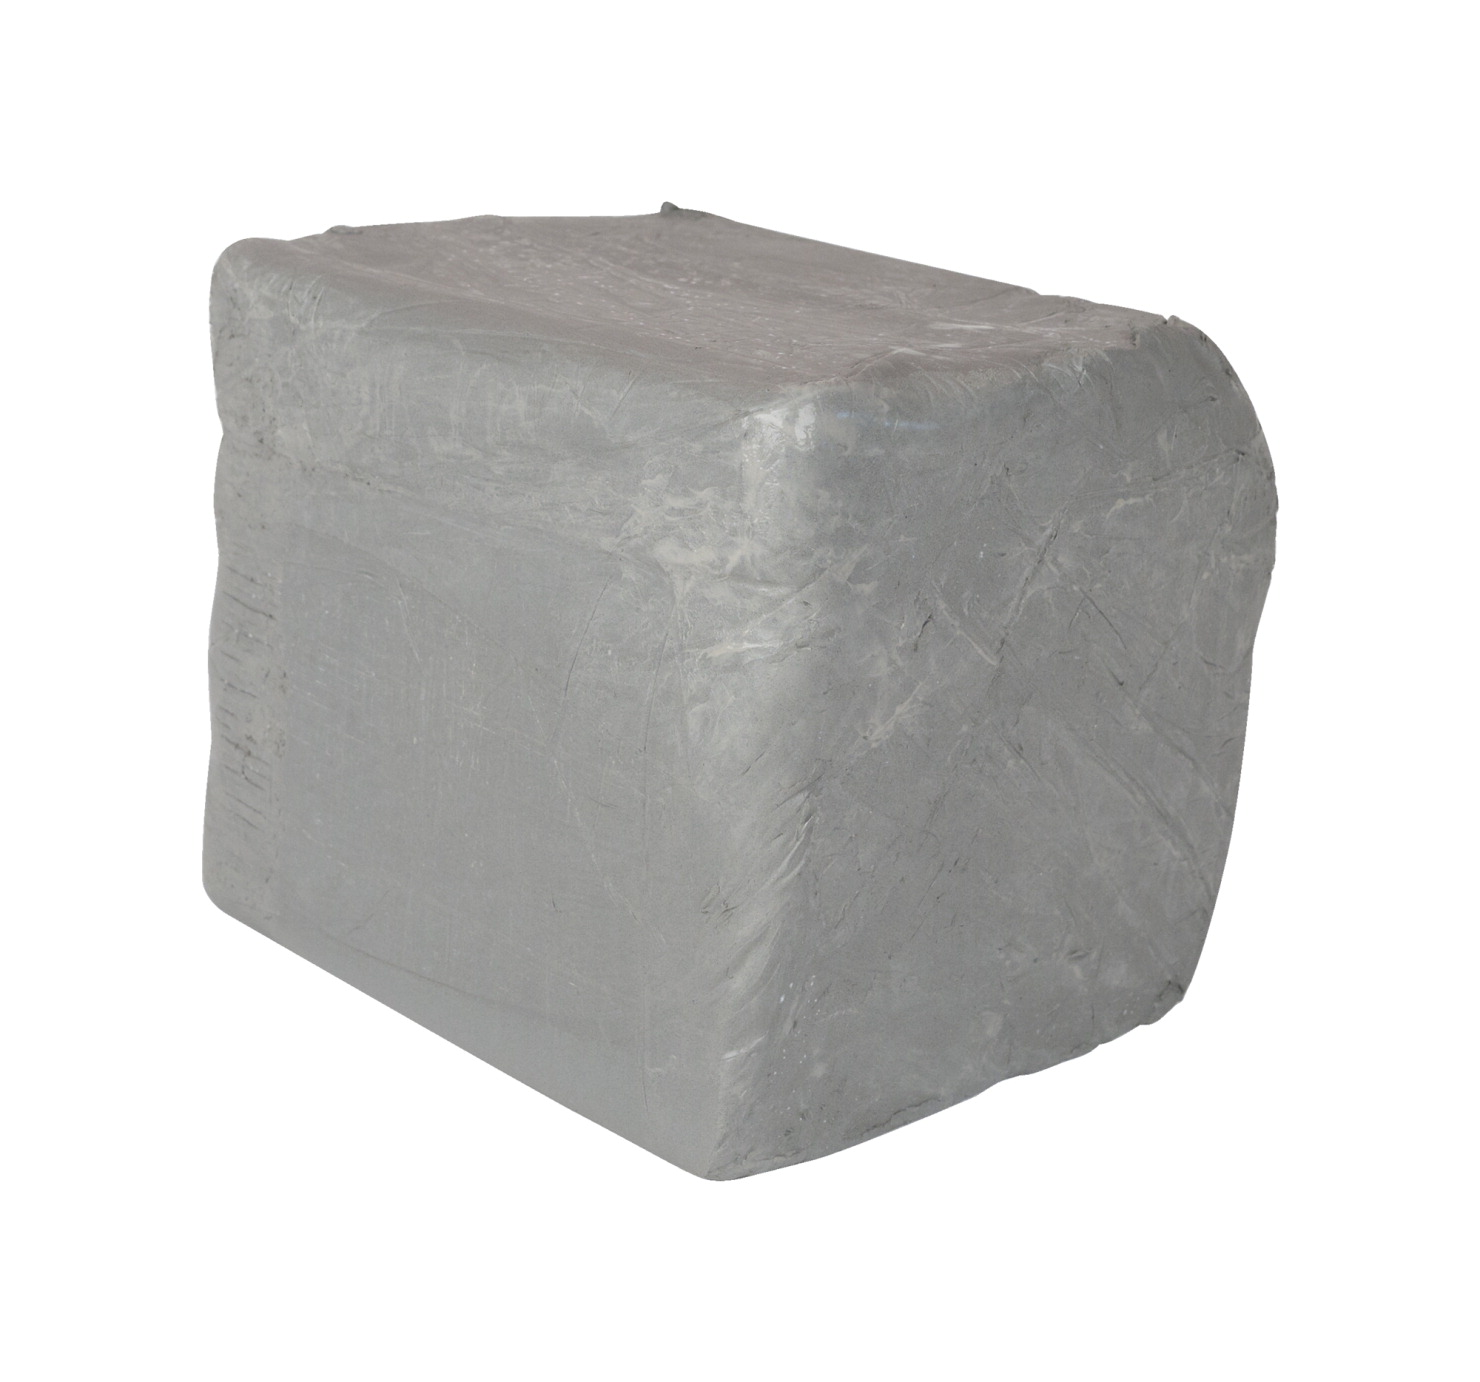 Fire Clay 50 Lb Bag : Amaco earthenware versa clay white school specialty canada